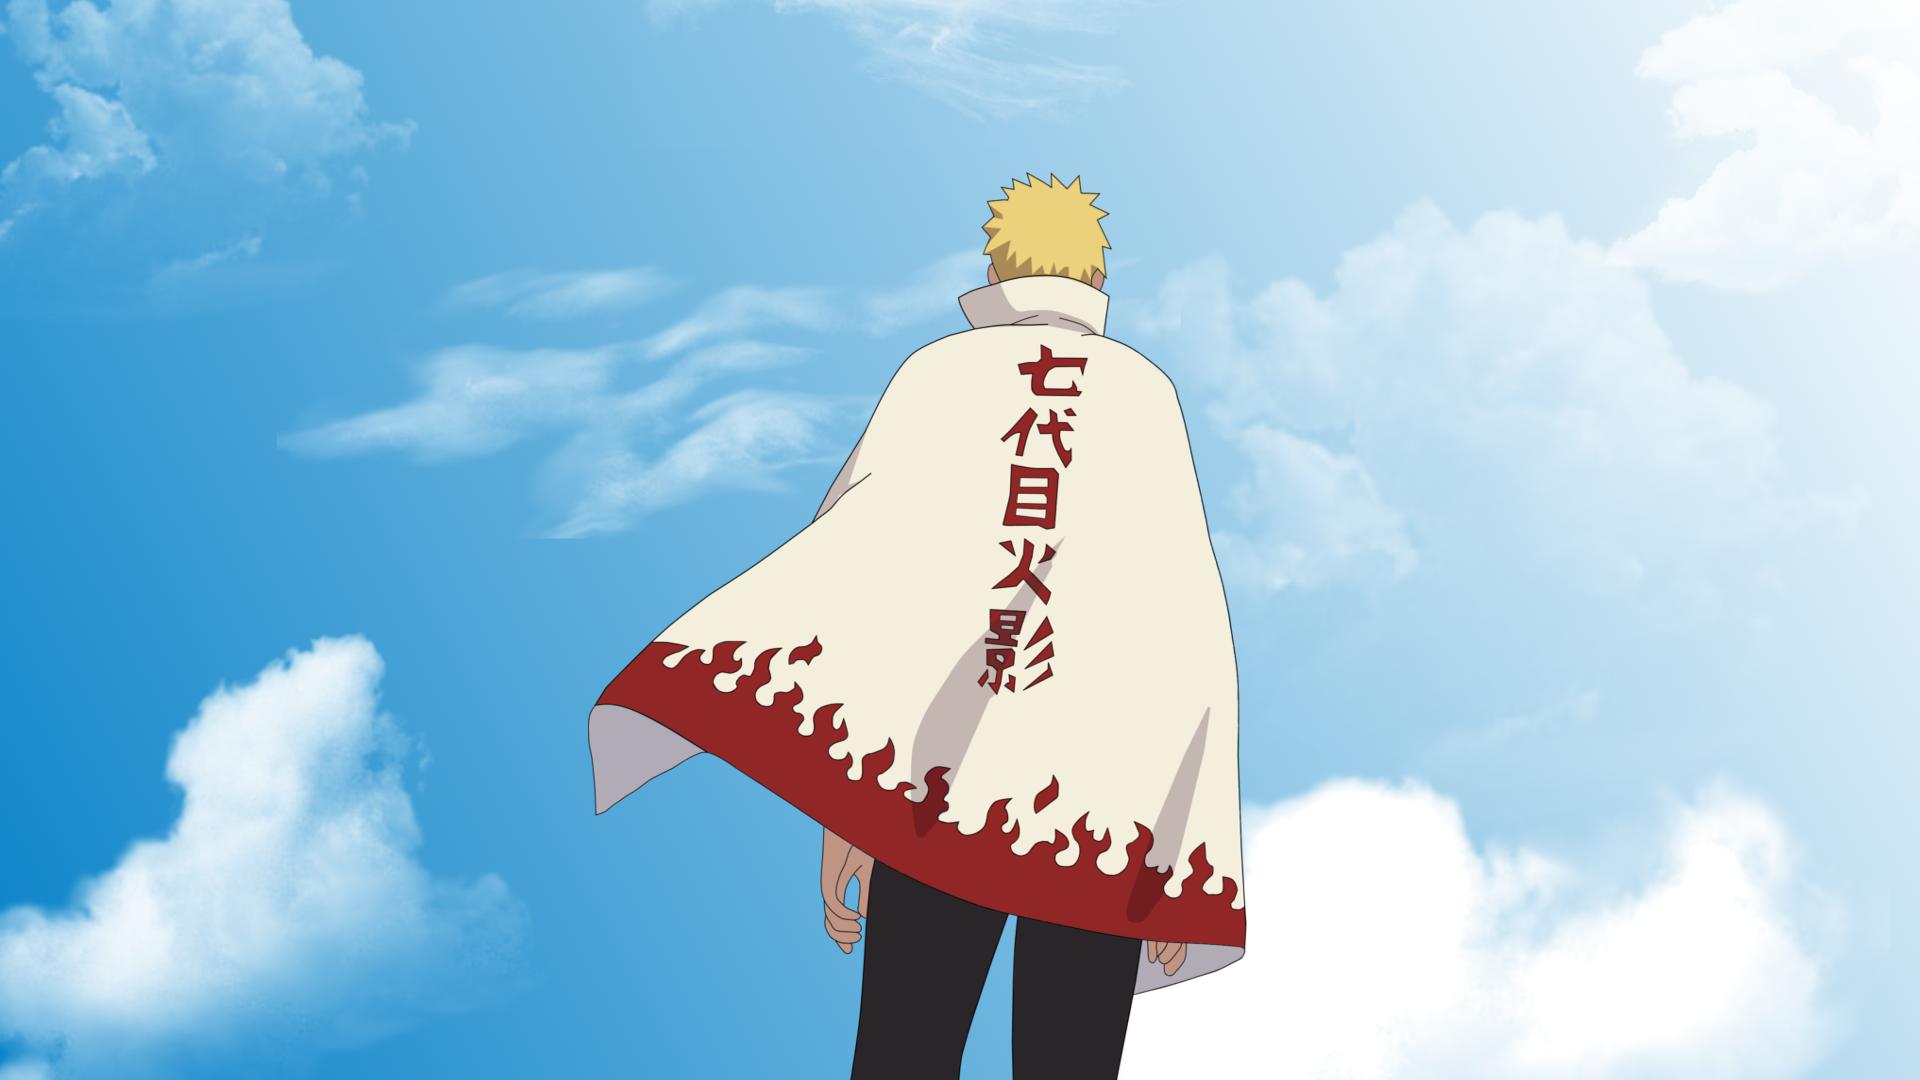 Anime Naruto Tapeta Image de naruto, Fond d'écran pc